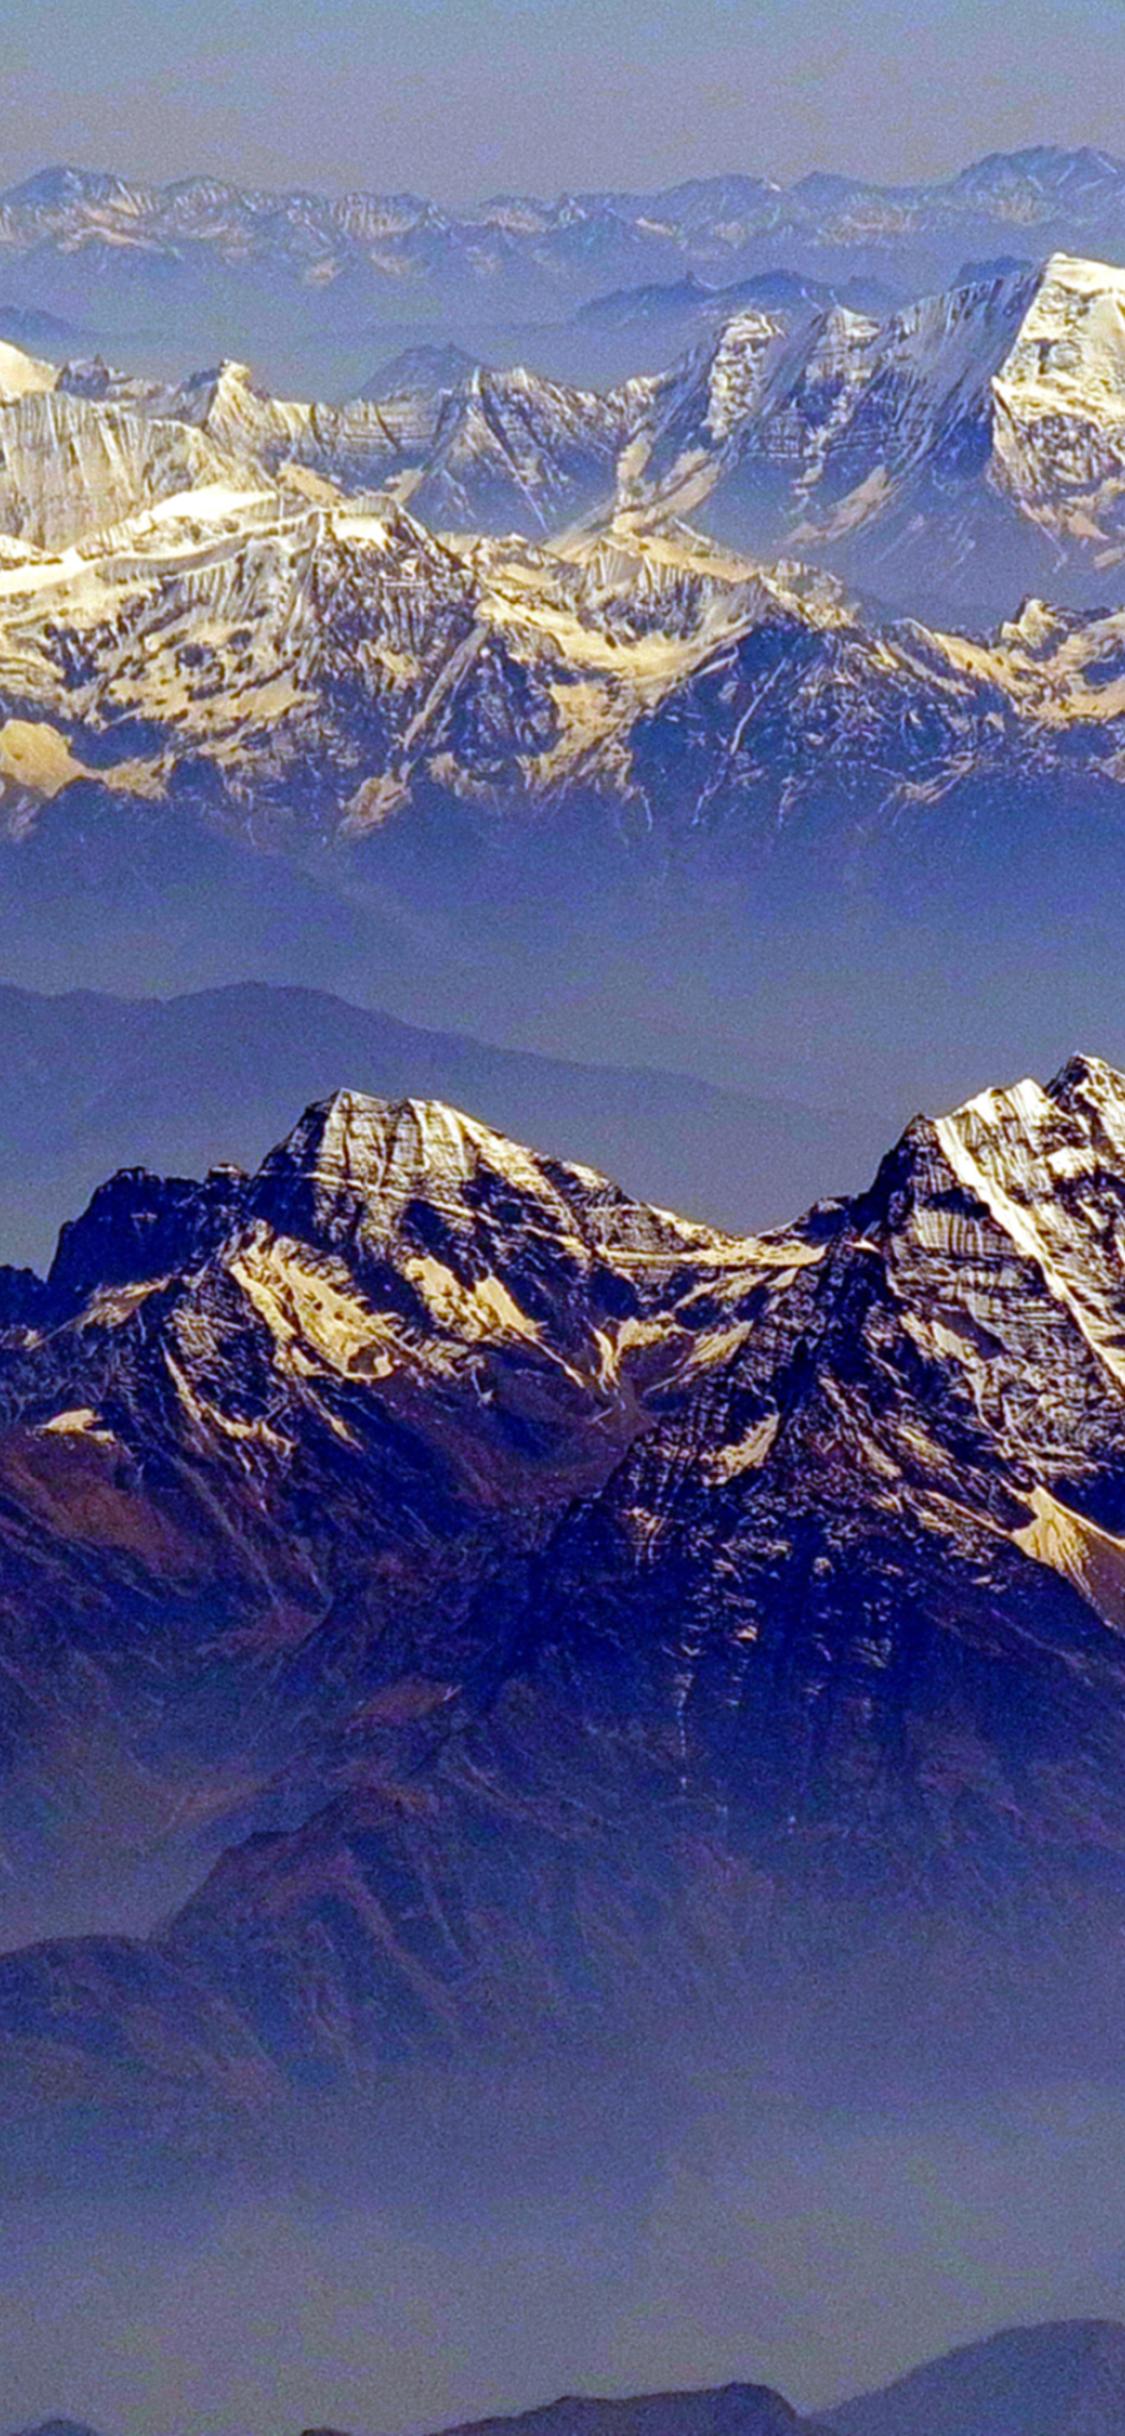 1125x2436 Himalaya 4K Iphone XS,Iphone 10,Iphone X ...